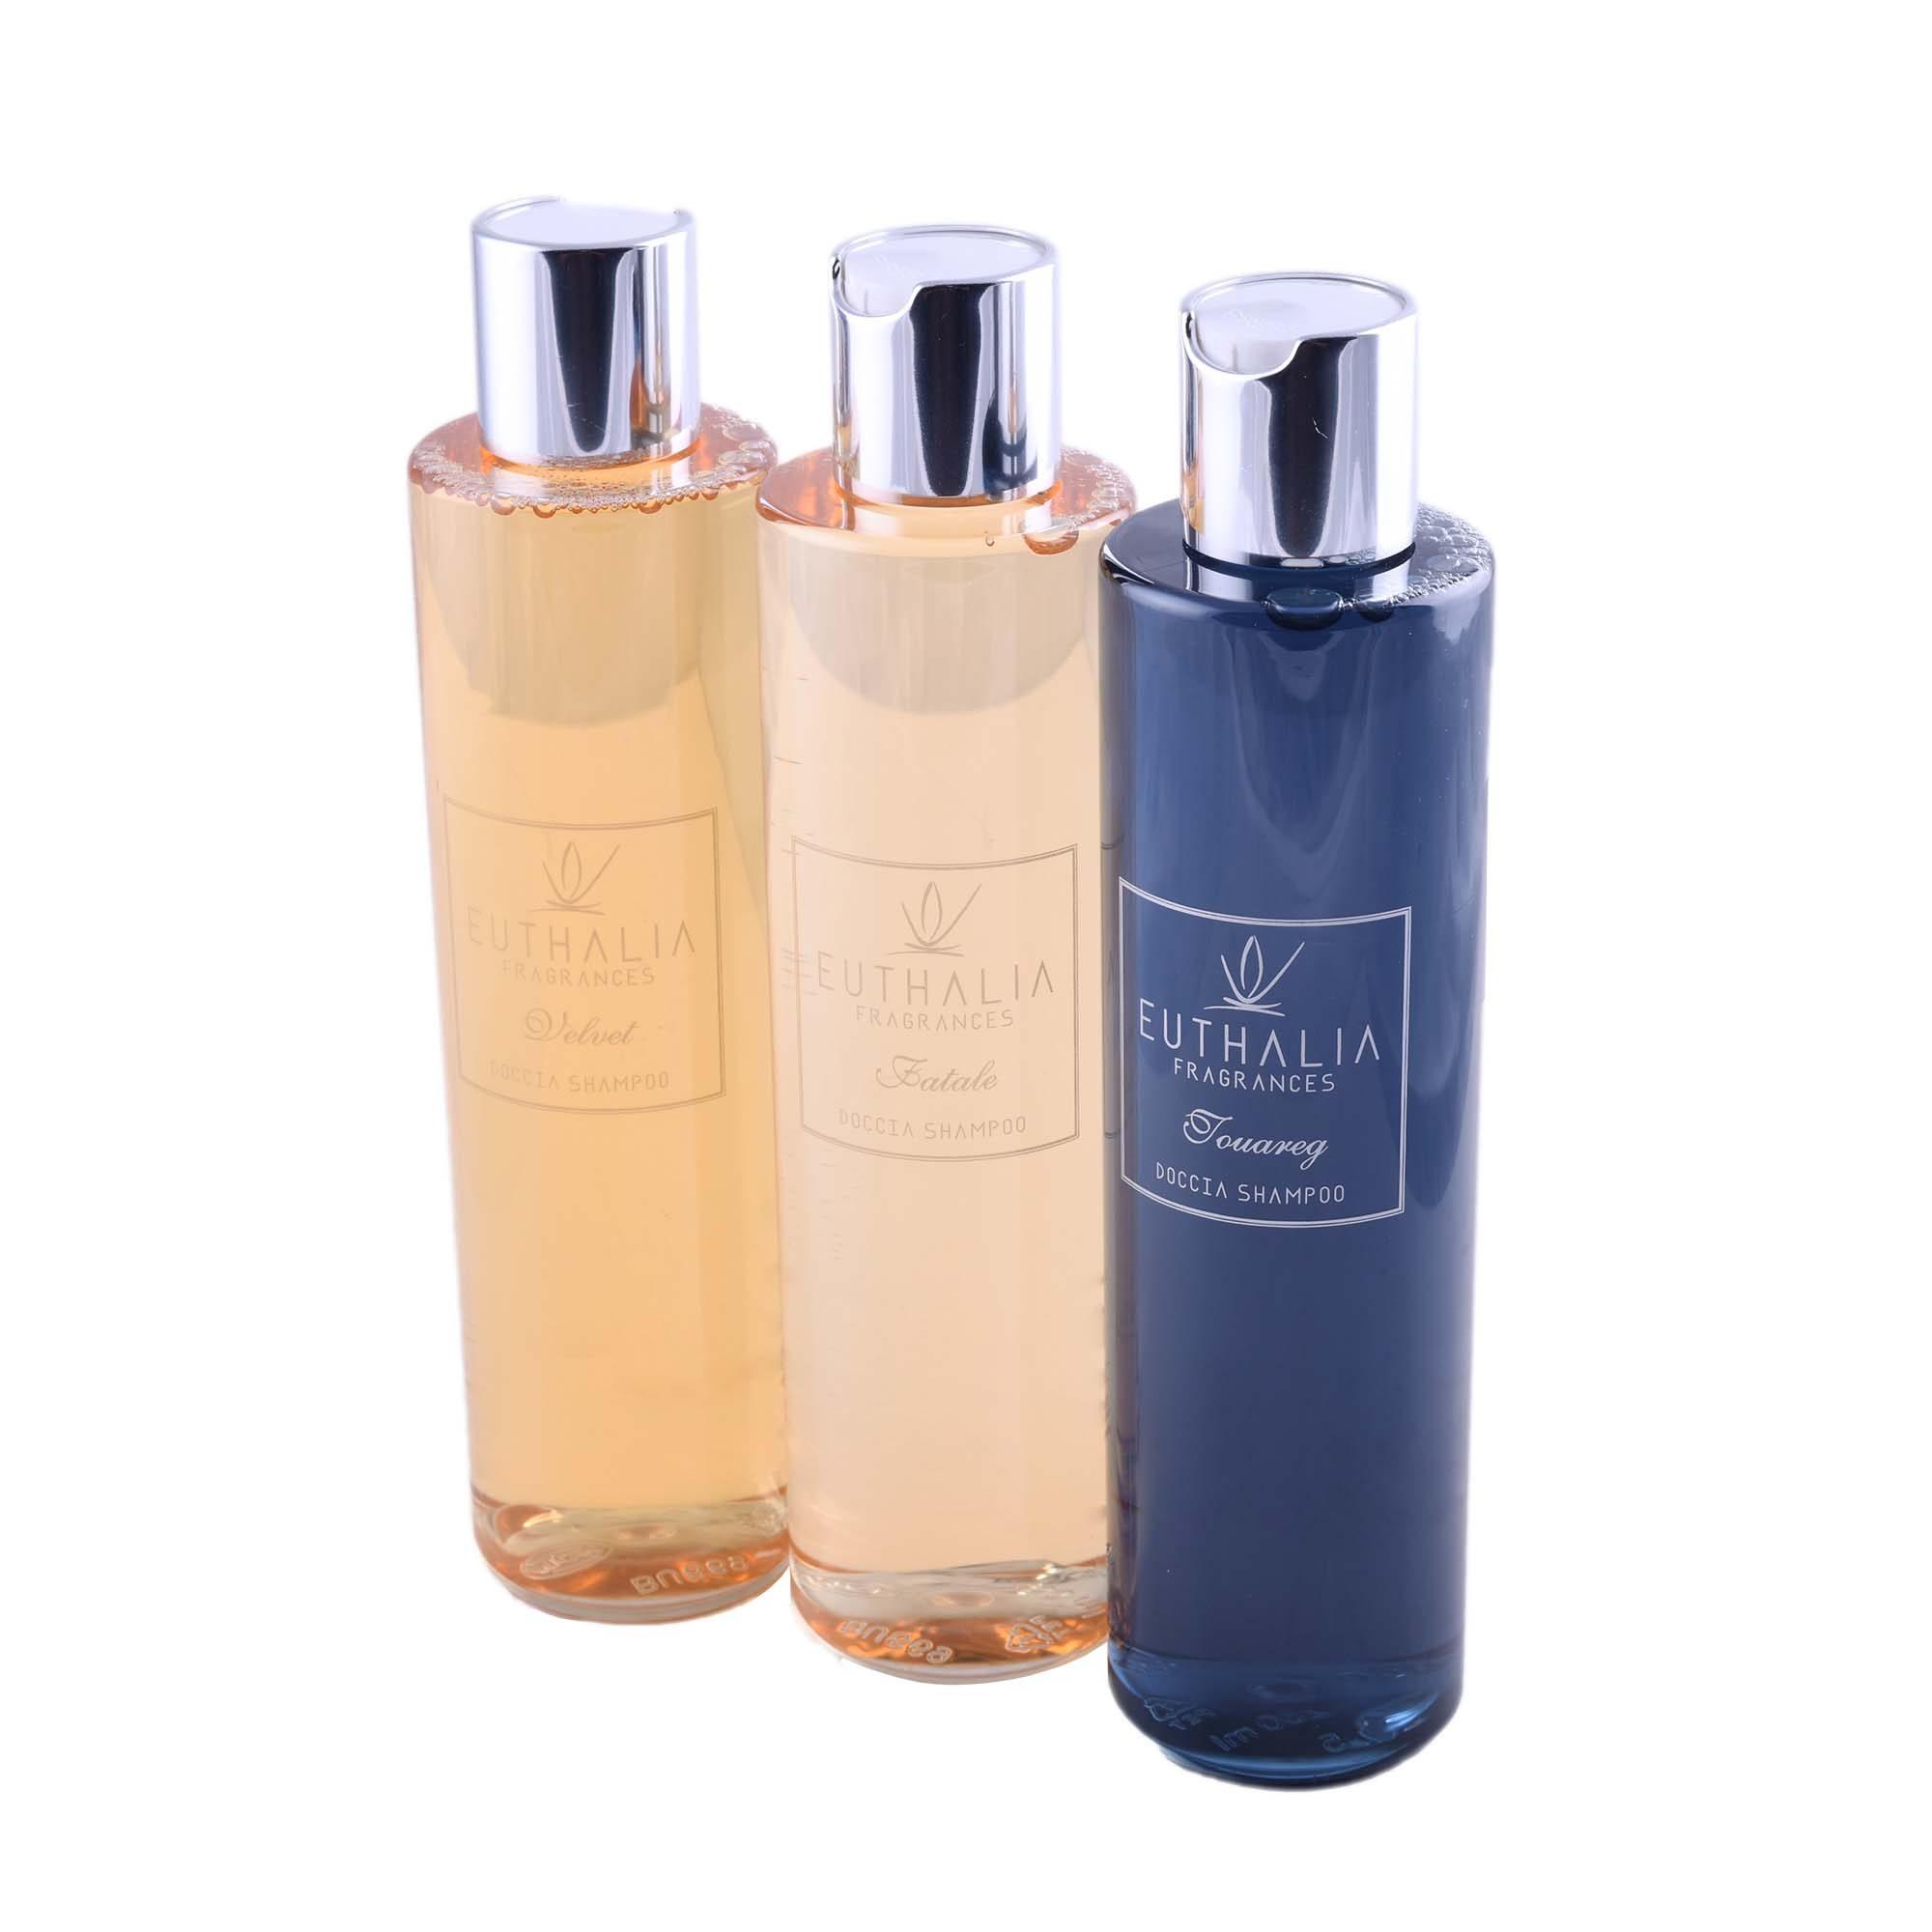 Euthalia Fragrances Doccia Shampoo